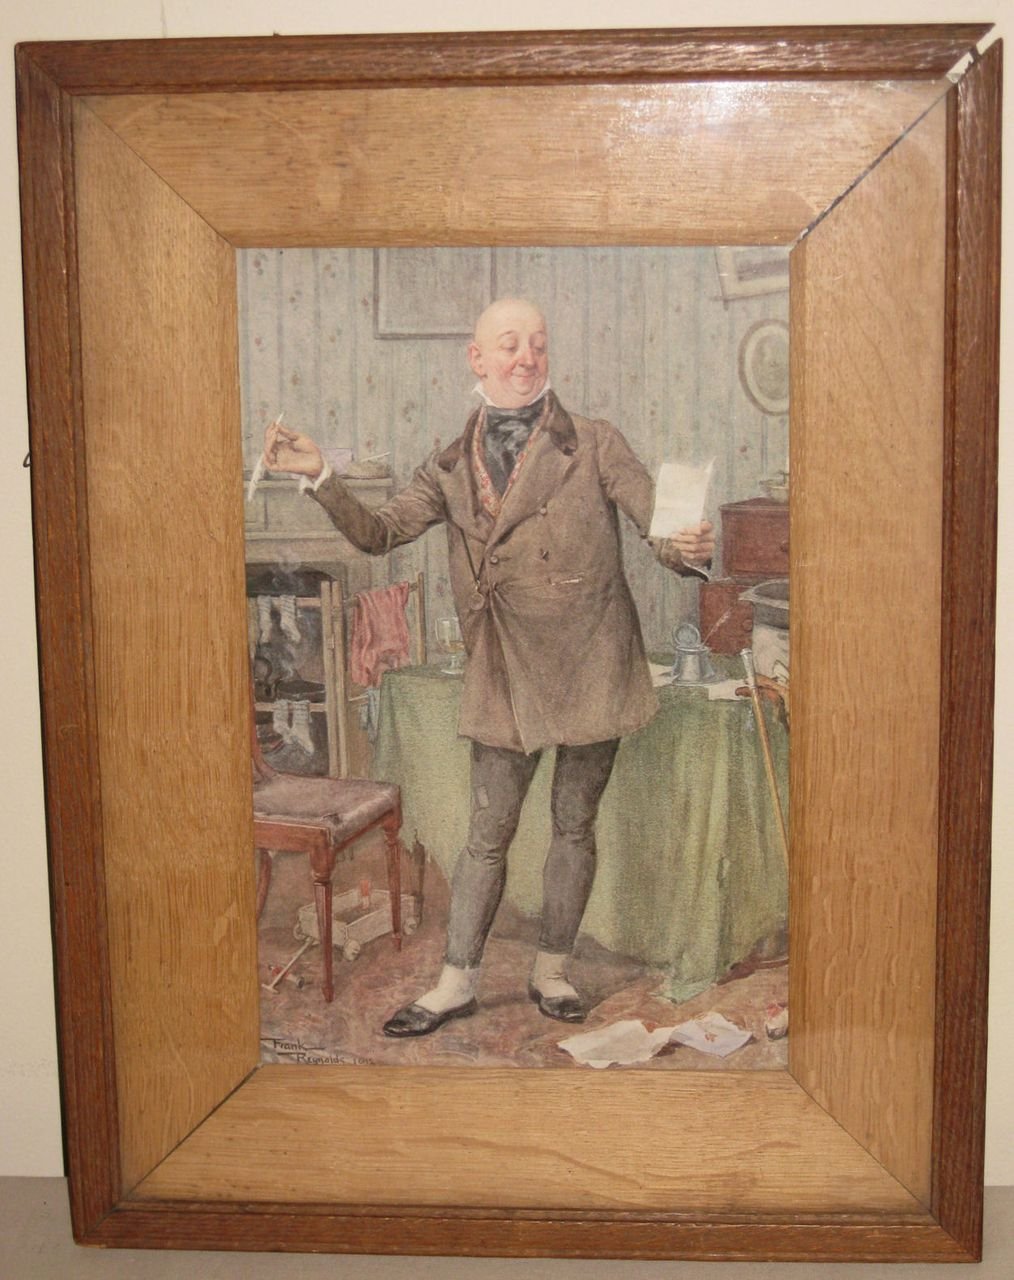 Framed English Print of Gentleman by Frank Reynolds